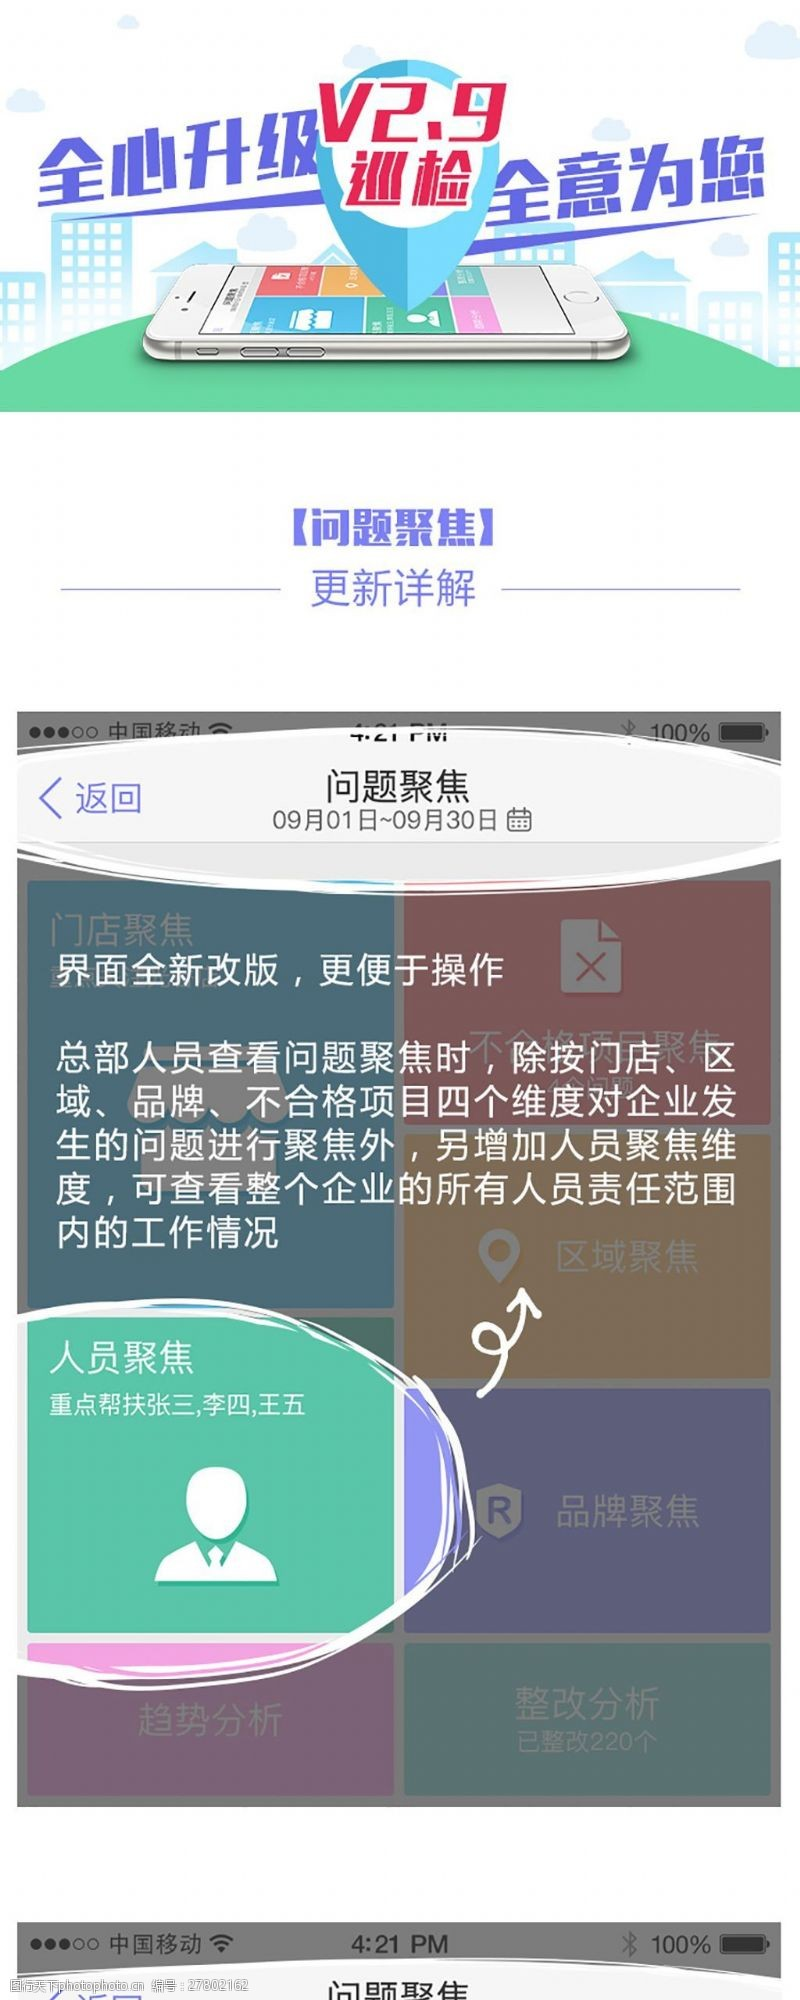 app功能手机软件学习APP功能更新